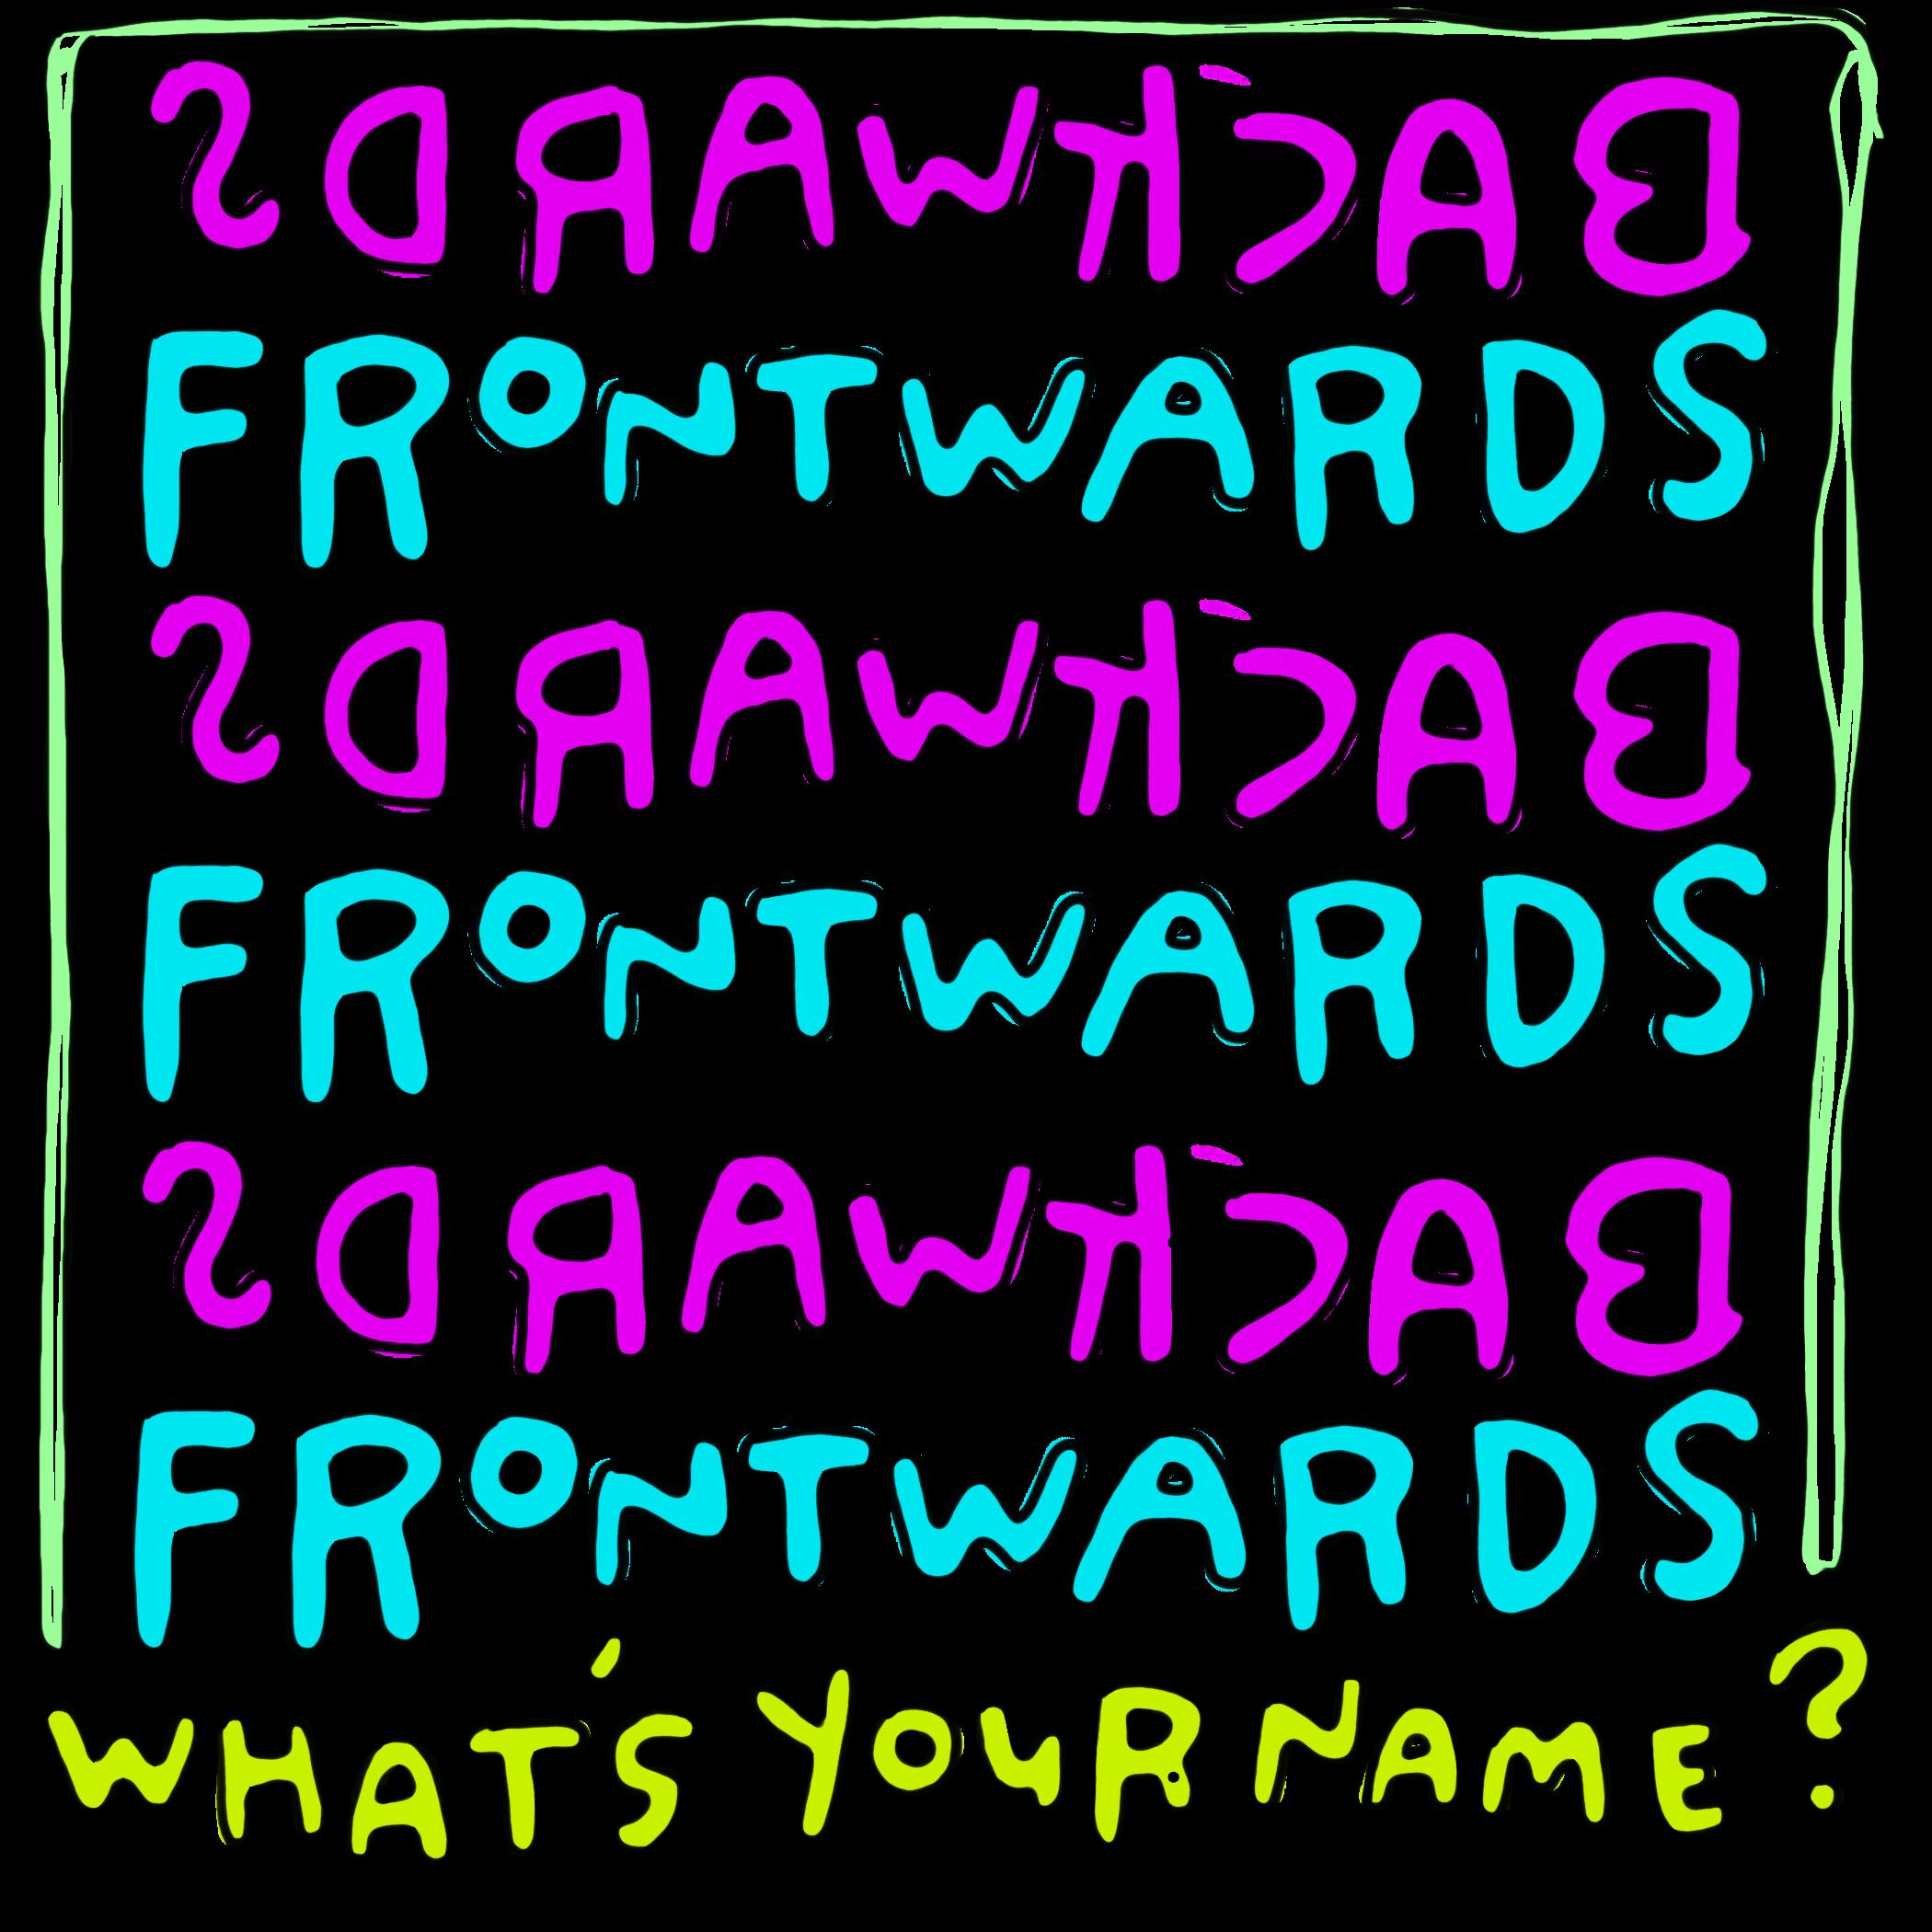 jordan_kushins_backwards_frontwards.png